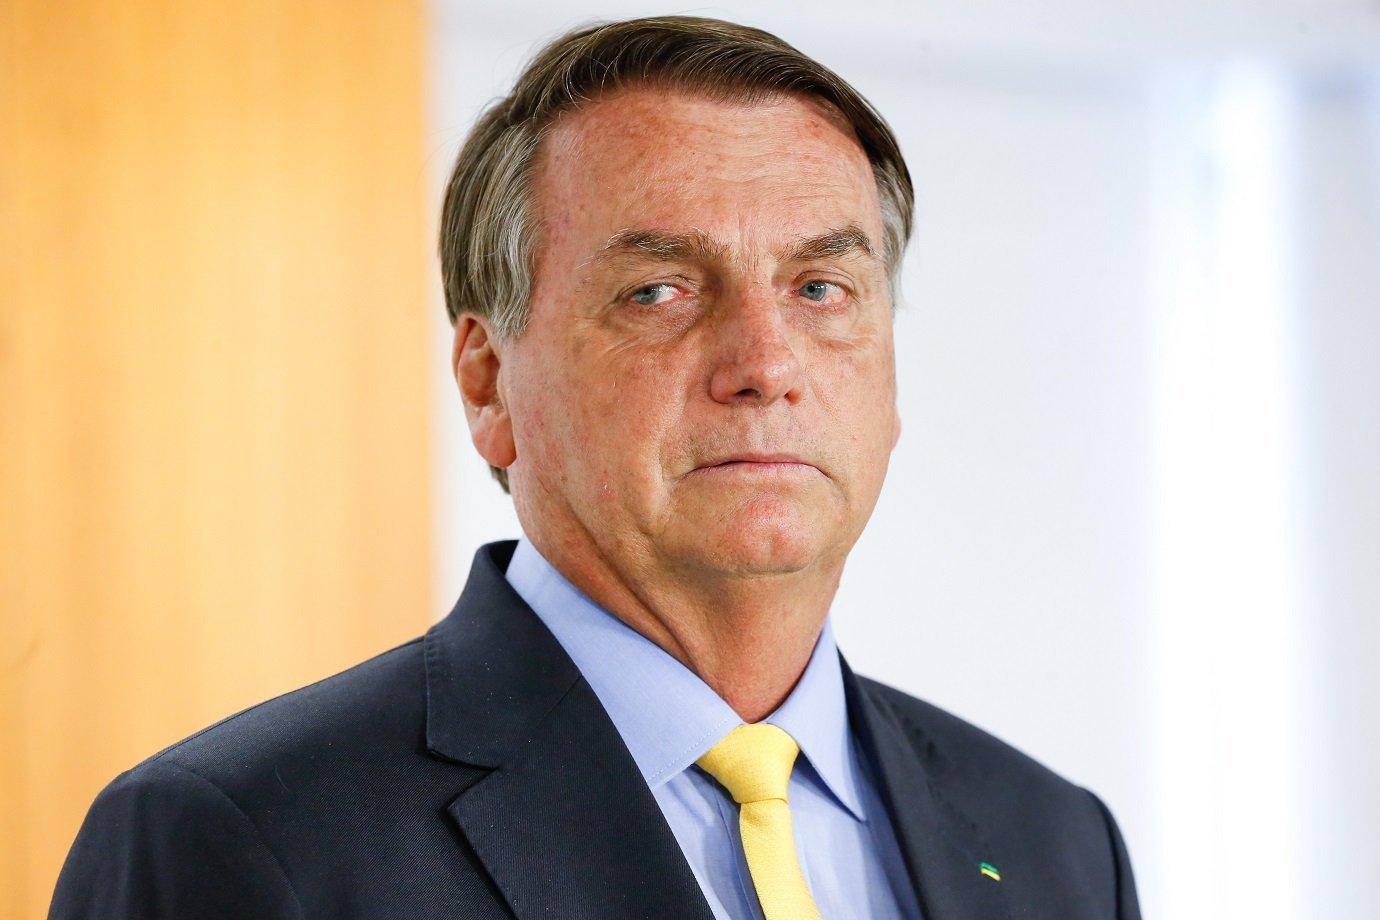 Presidente Jair Bolsonaro. (Foto: Reprodução/Alan Santos/PR/Flickr)